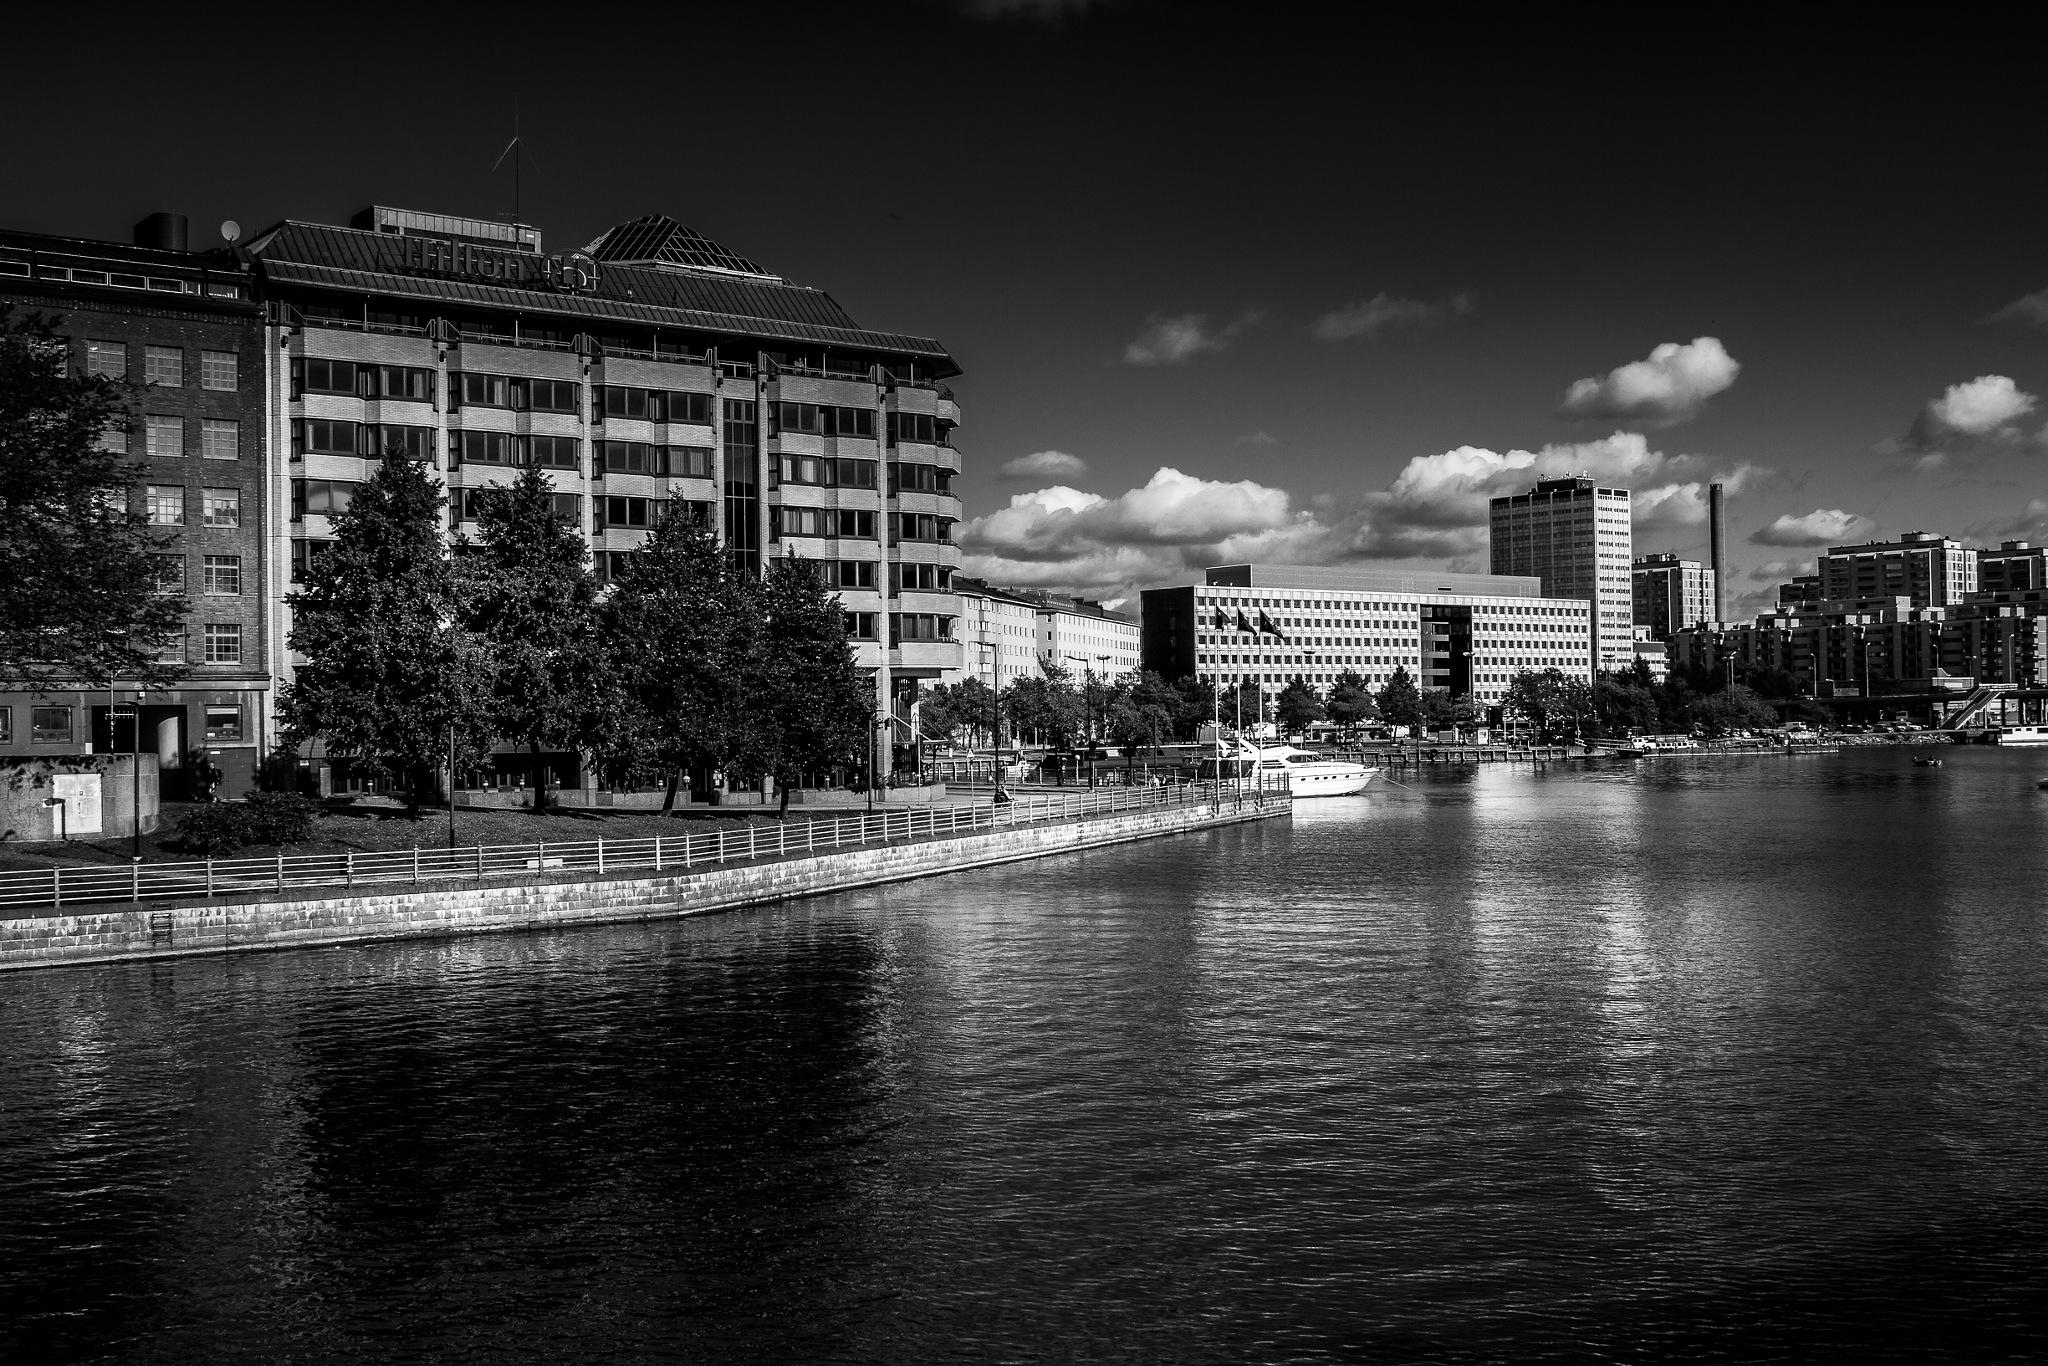 Helsinki Hilton by Scottmcc